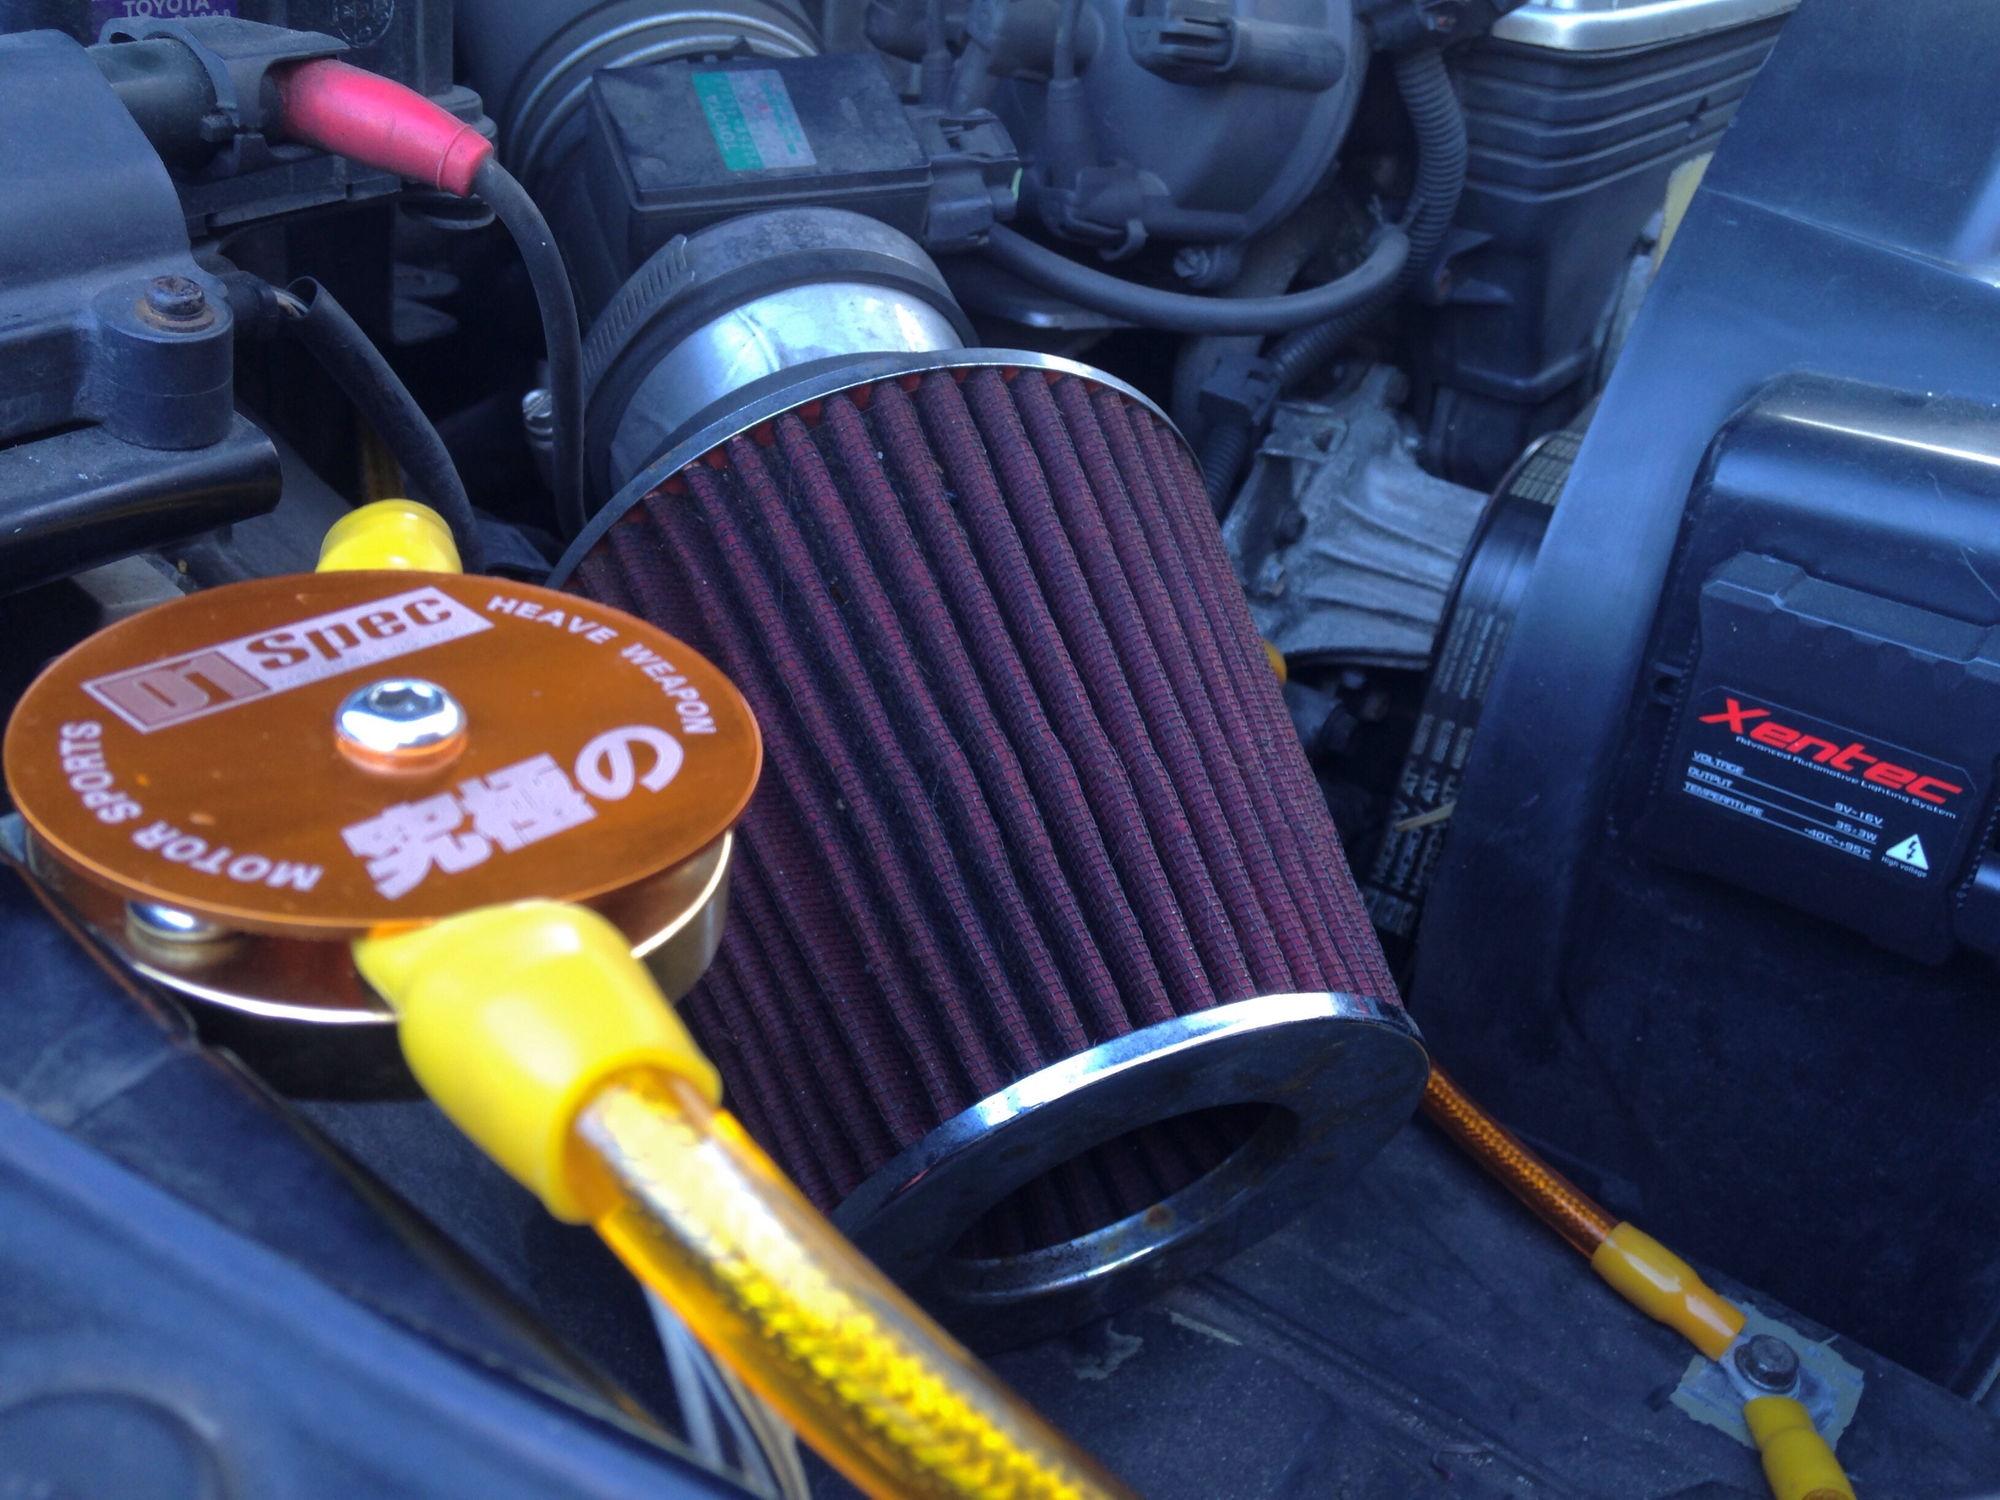 Lexus Ls400 Stereo Wiring Diagram Master Blogs 1995 Sc300 1992 Alternator B21 1997 Nissan